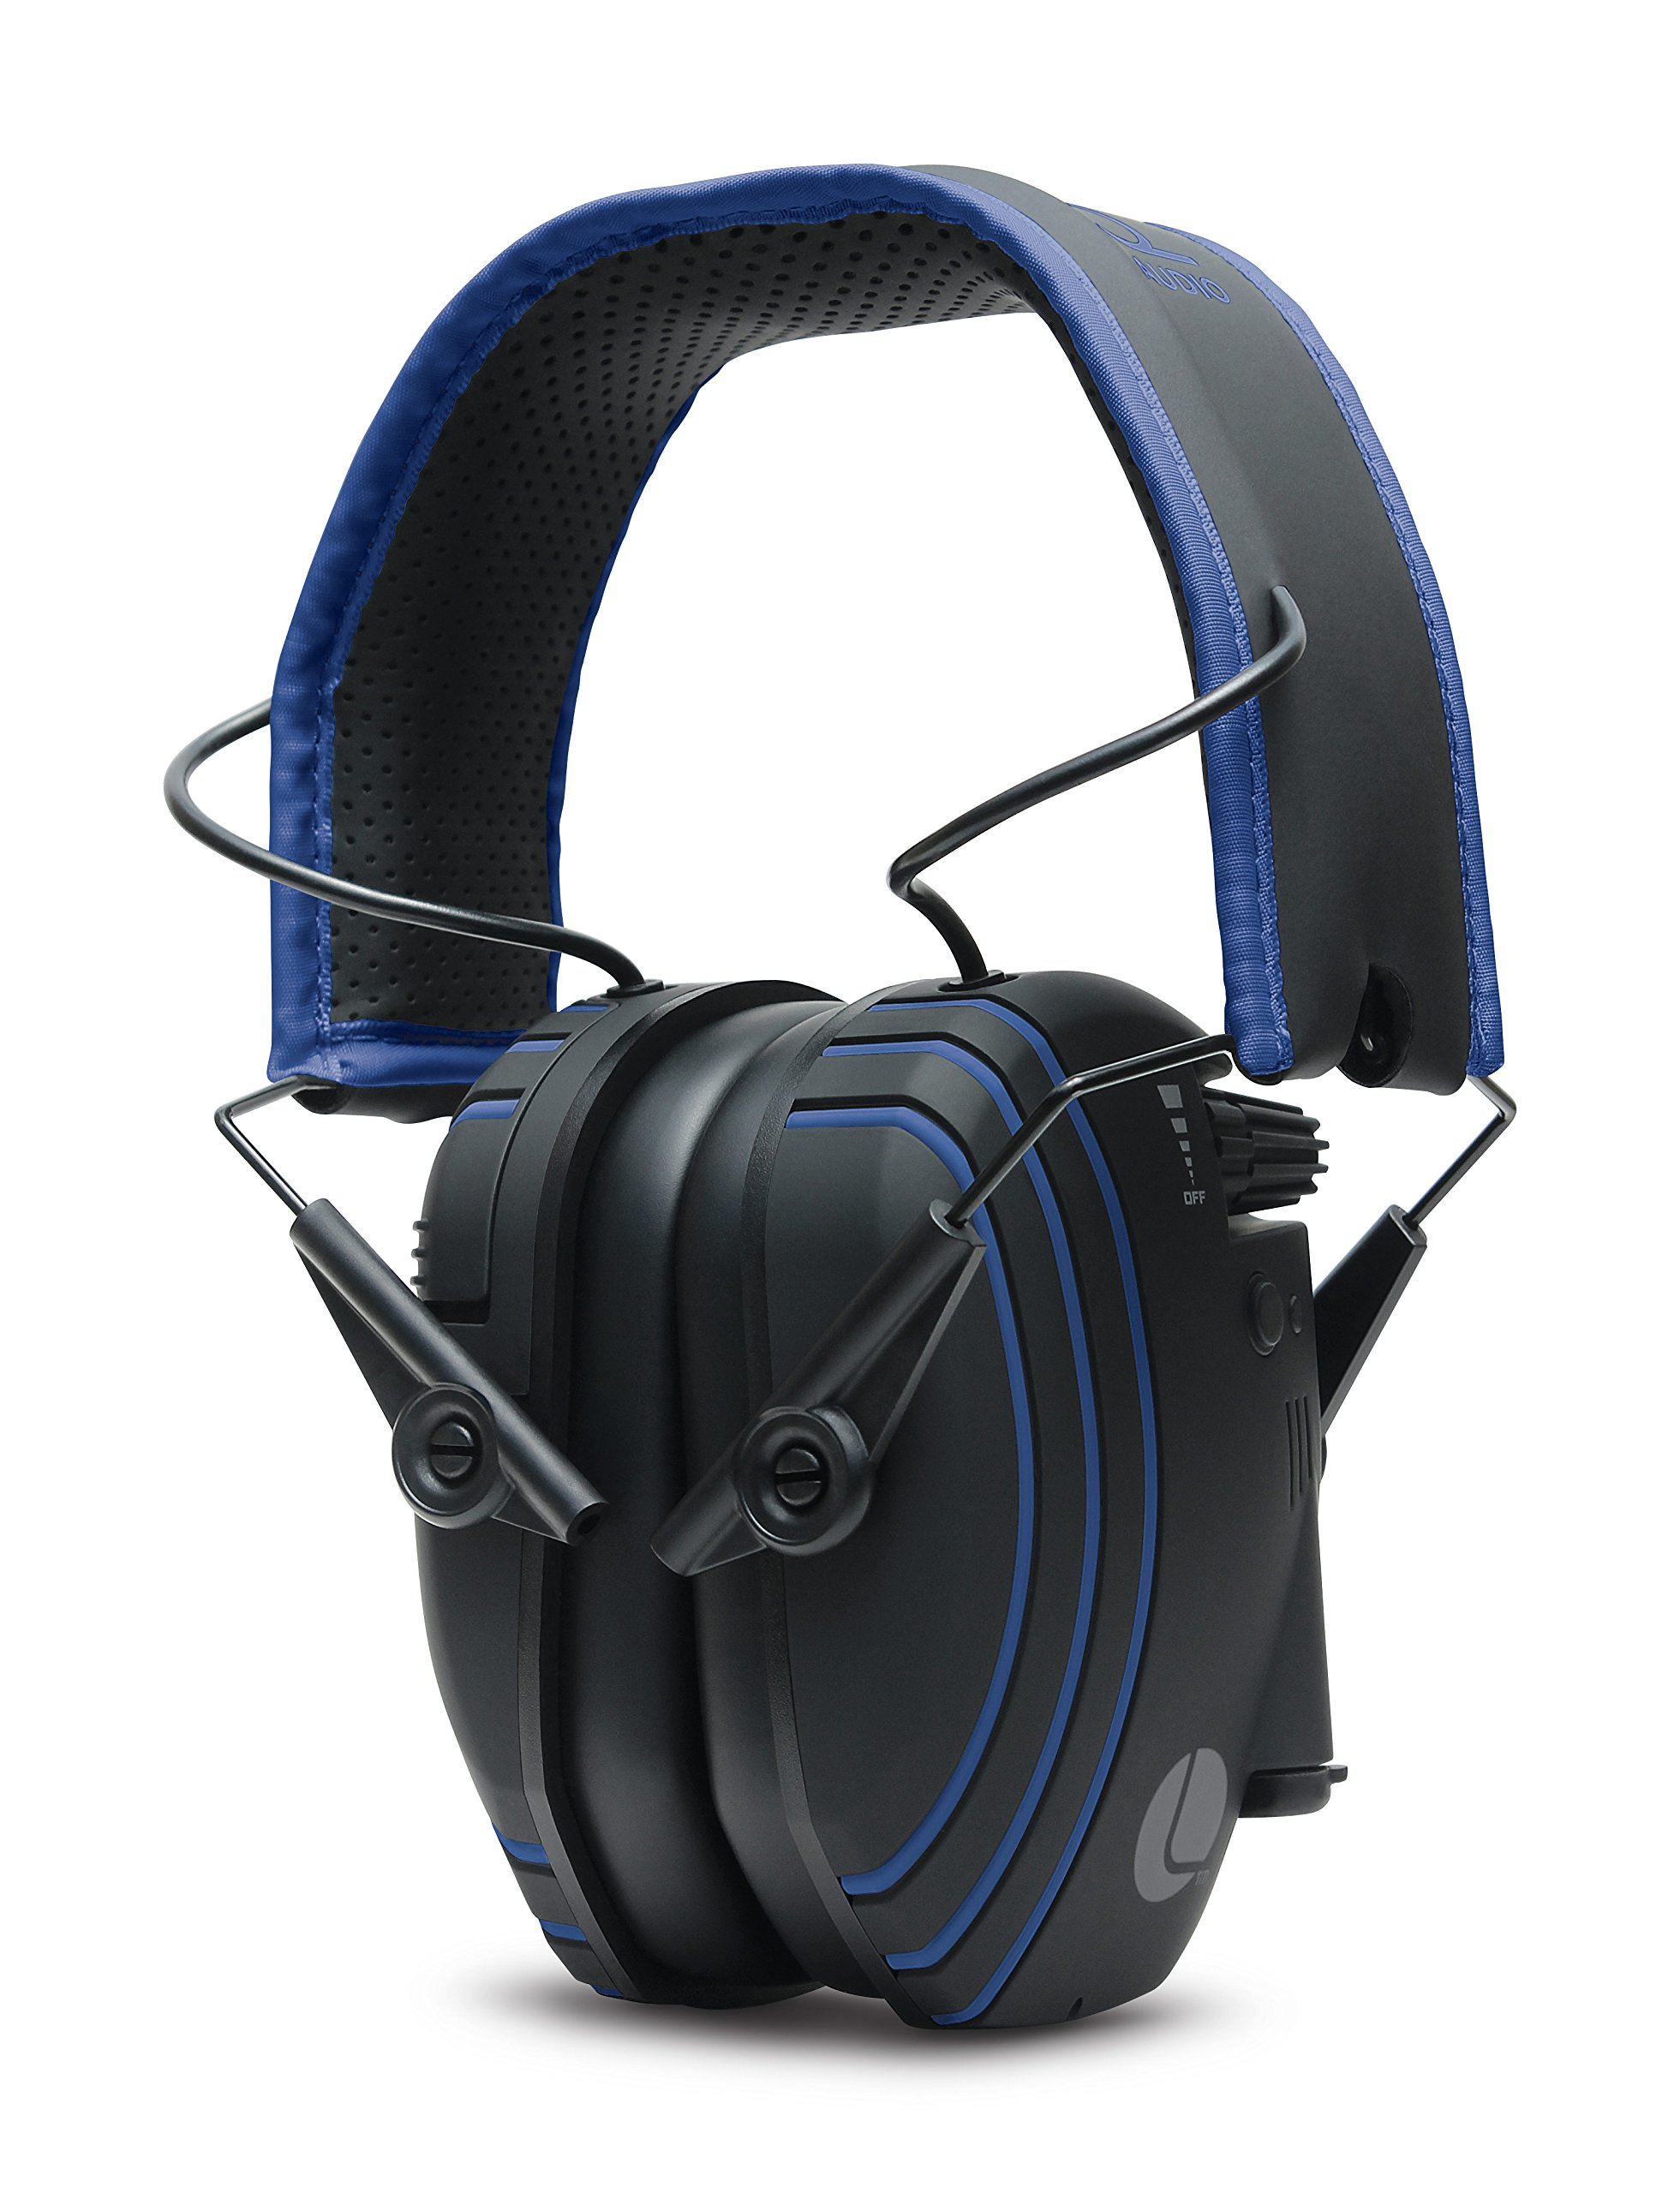 Lucid Audio AMPED Sound Amplifying Bluetooth Wireless Hearing Headphones - Black/Blue